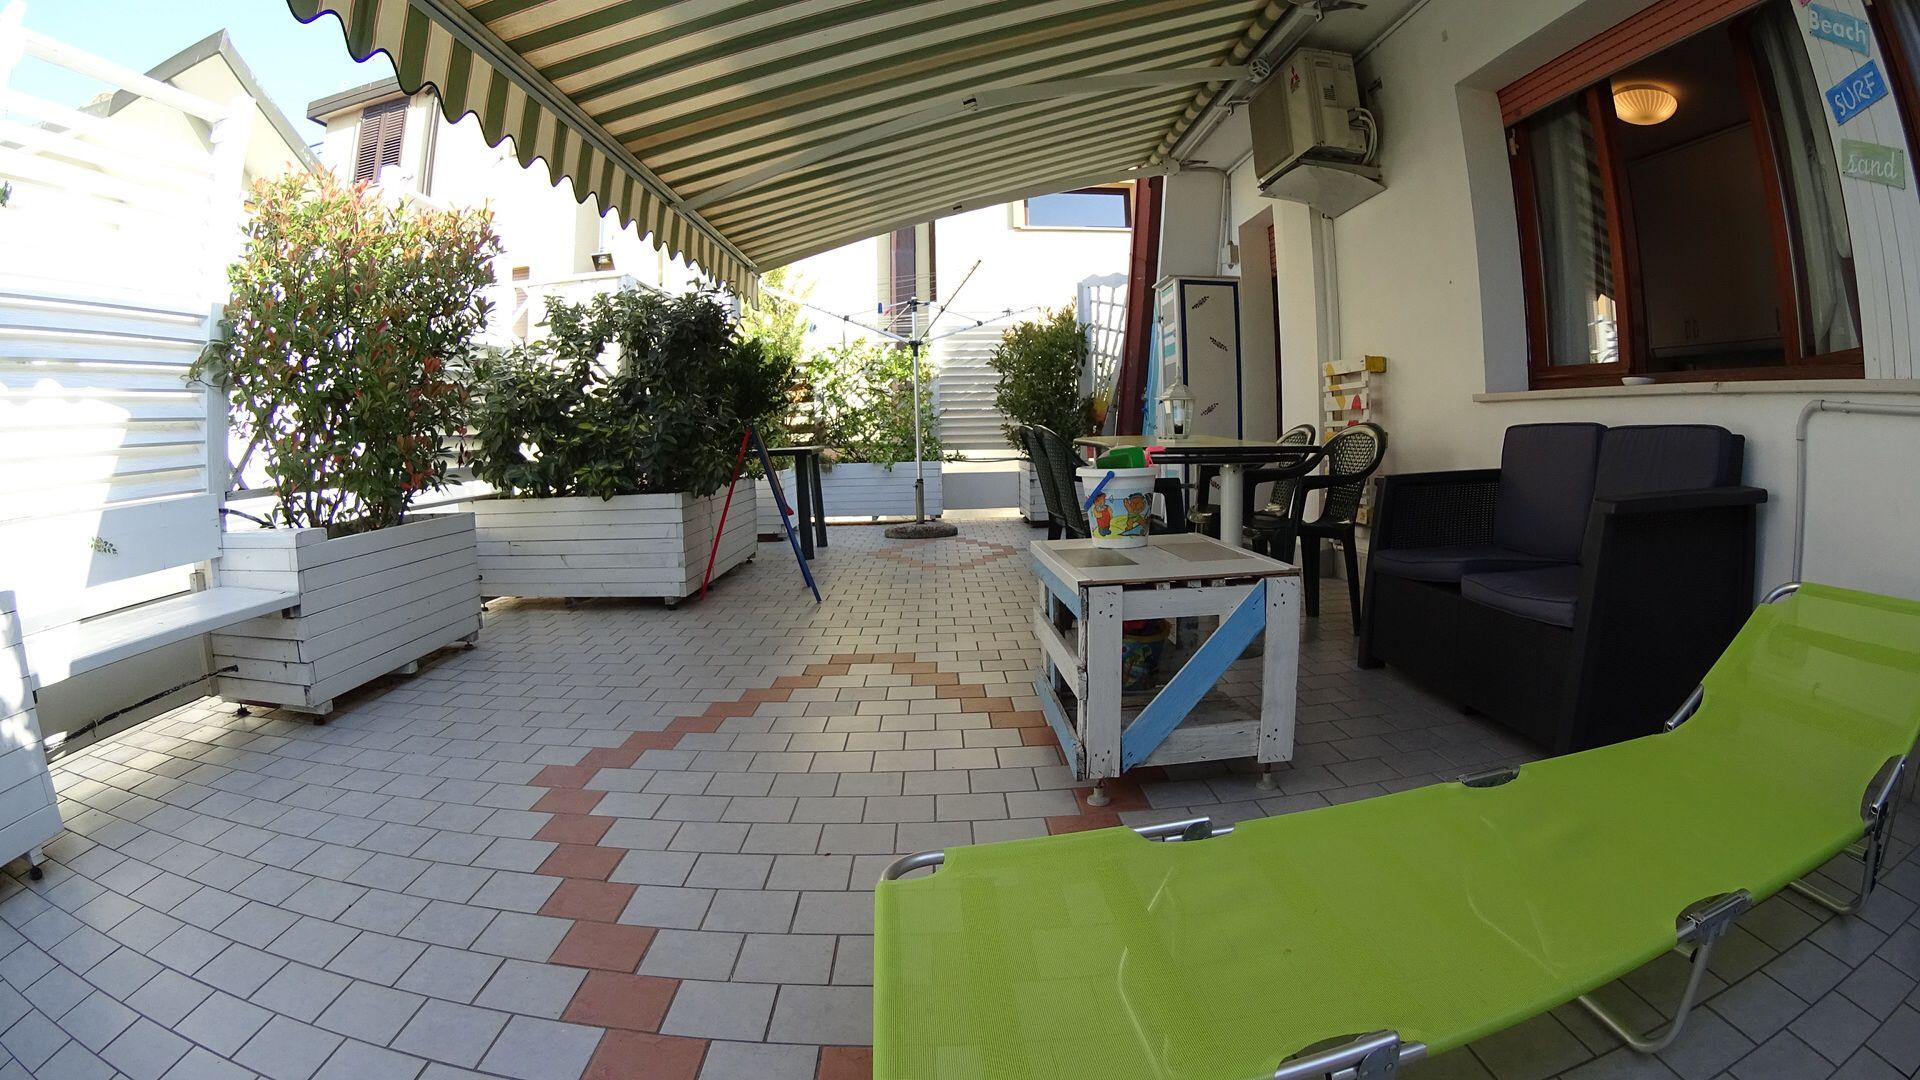 Ferienwohnung Bellaria - FerienhausUrlaub.com